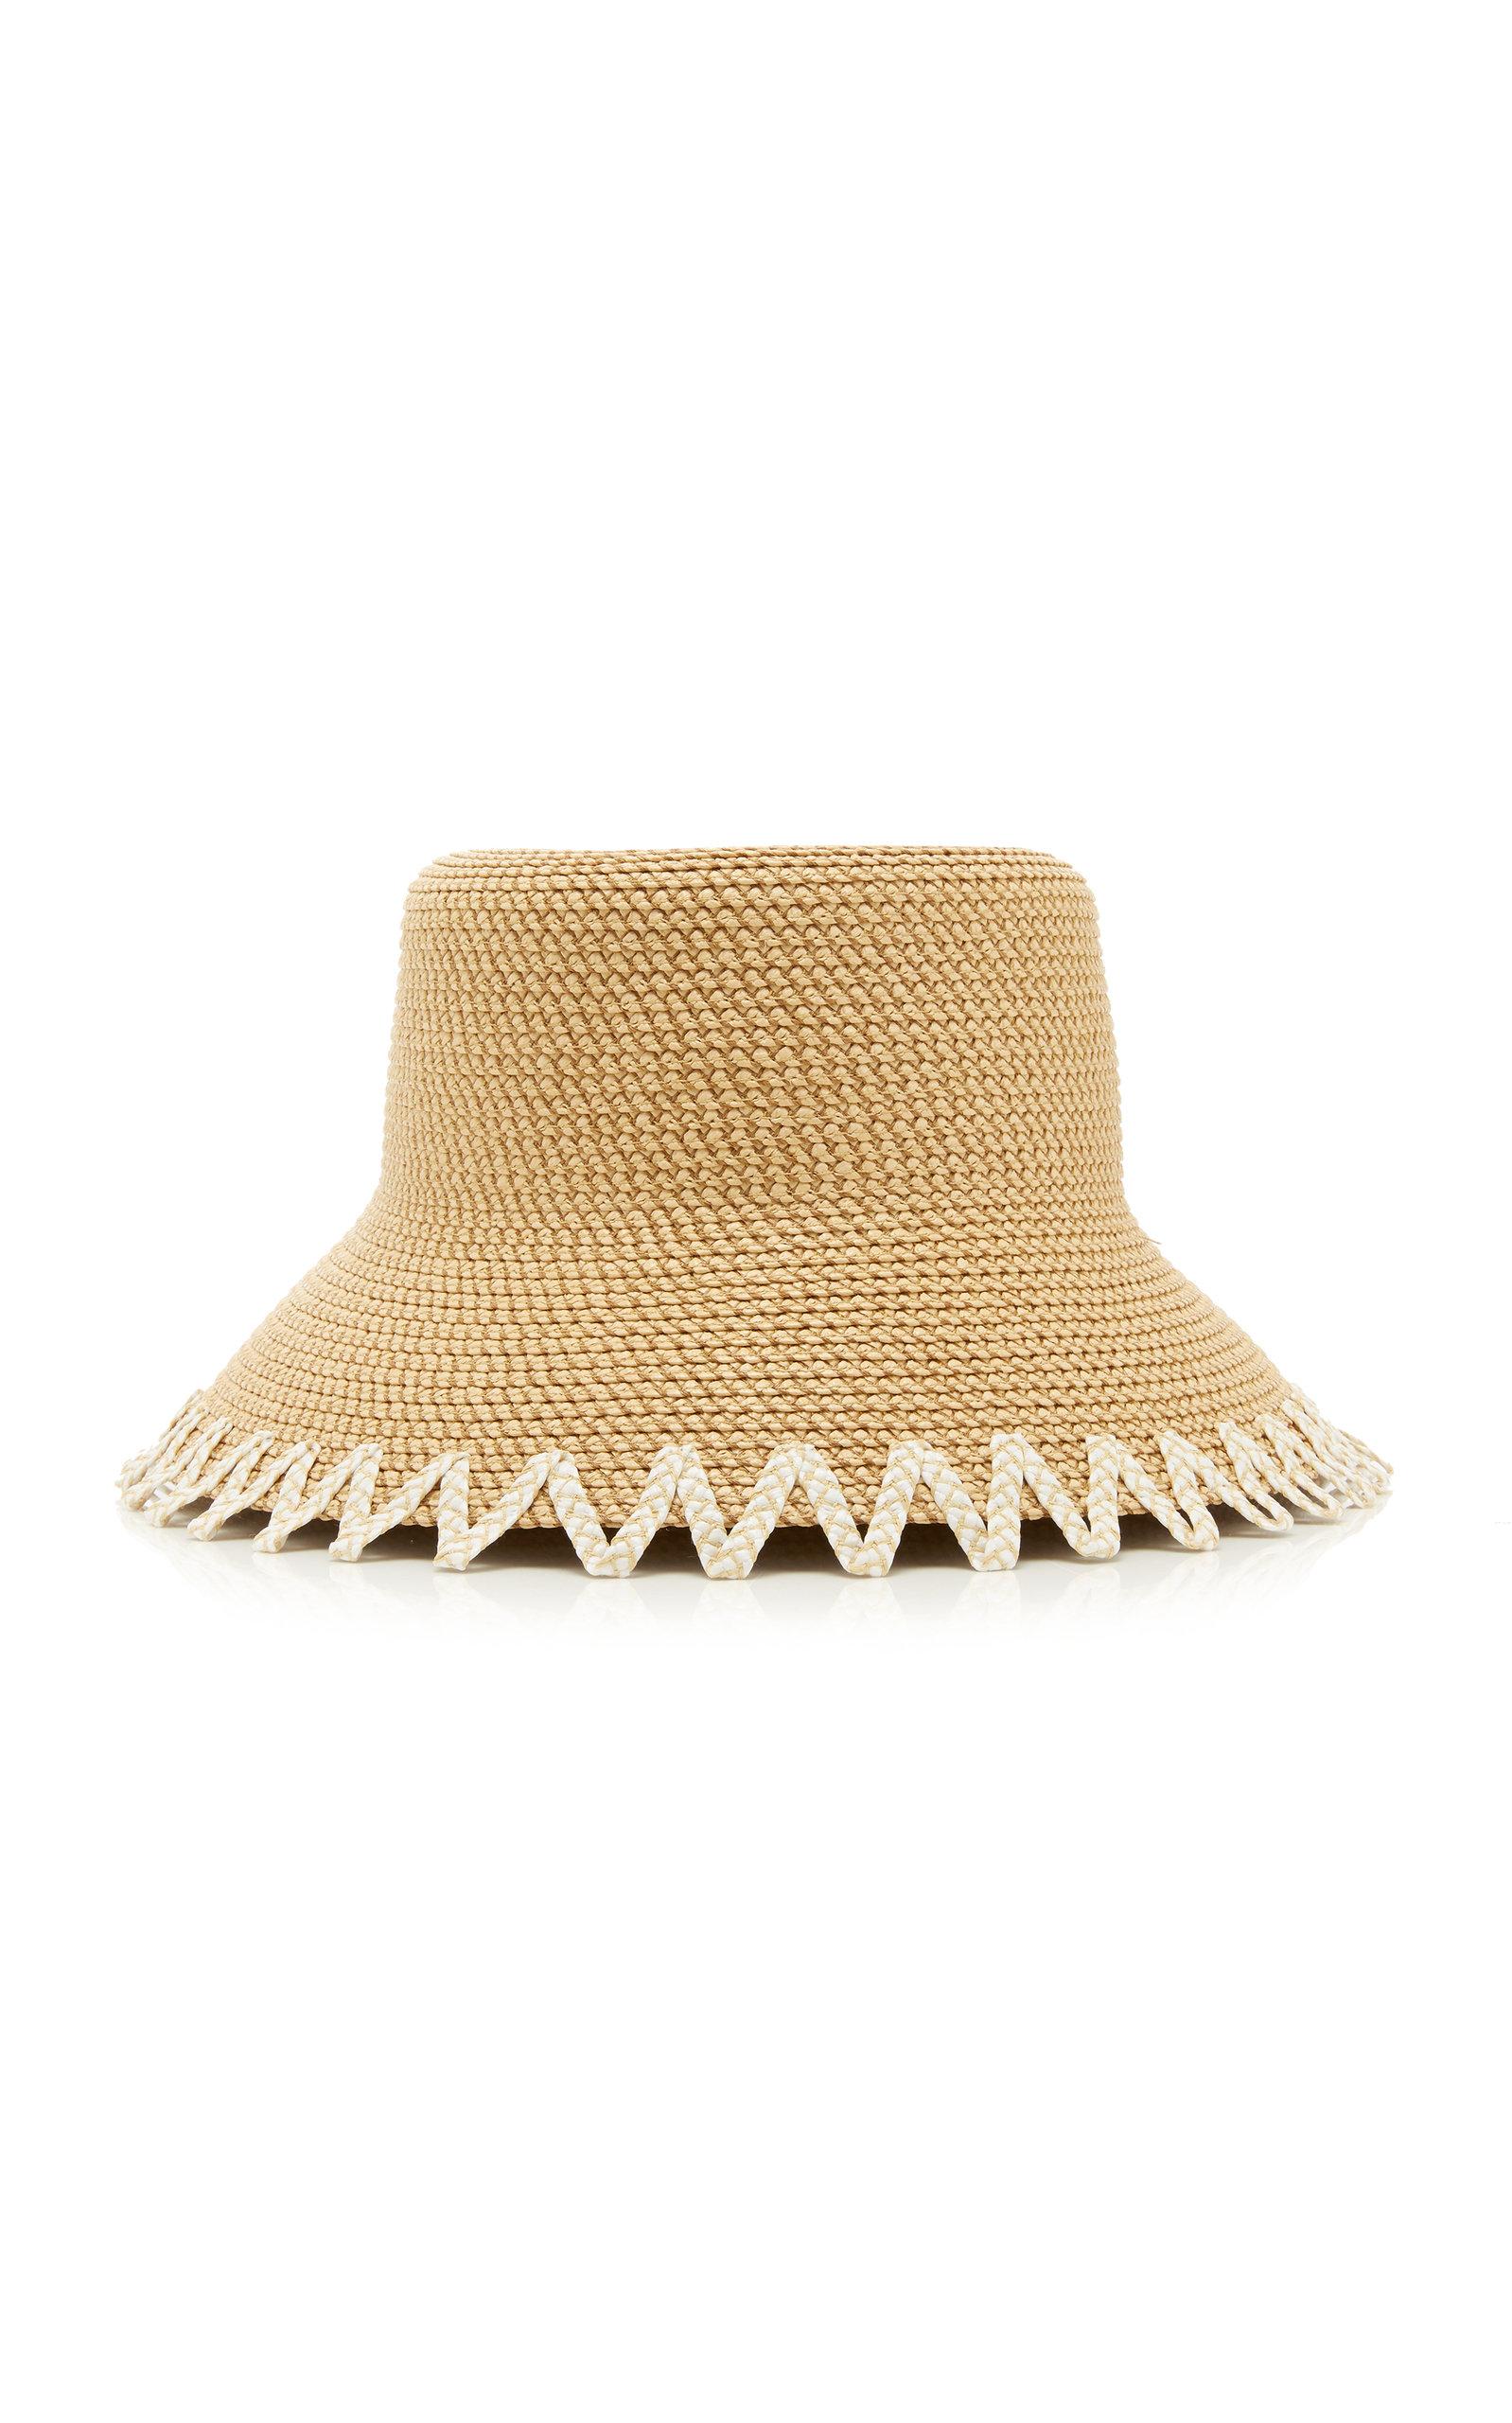 50bb8c24d38 Eric JavitsEloise Zig-Zag Trim Woven Bucket Hat. CLOSE. Loading